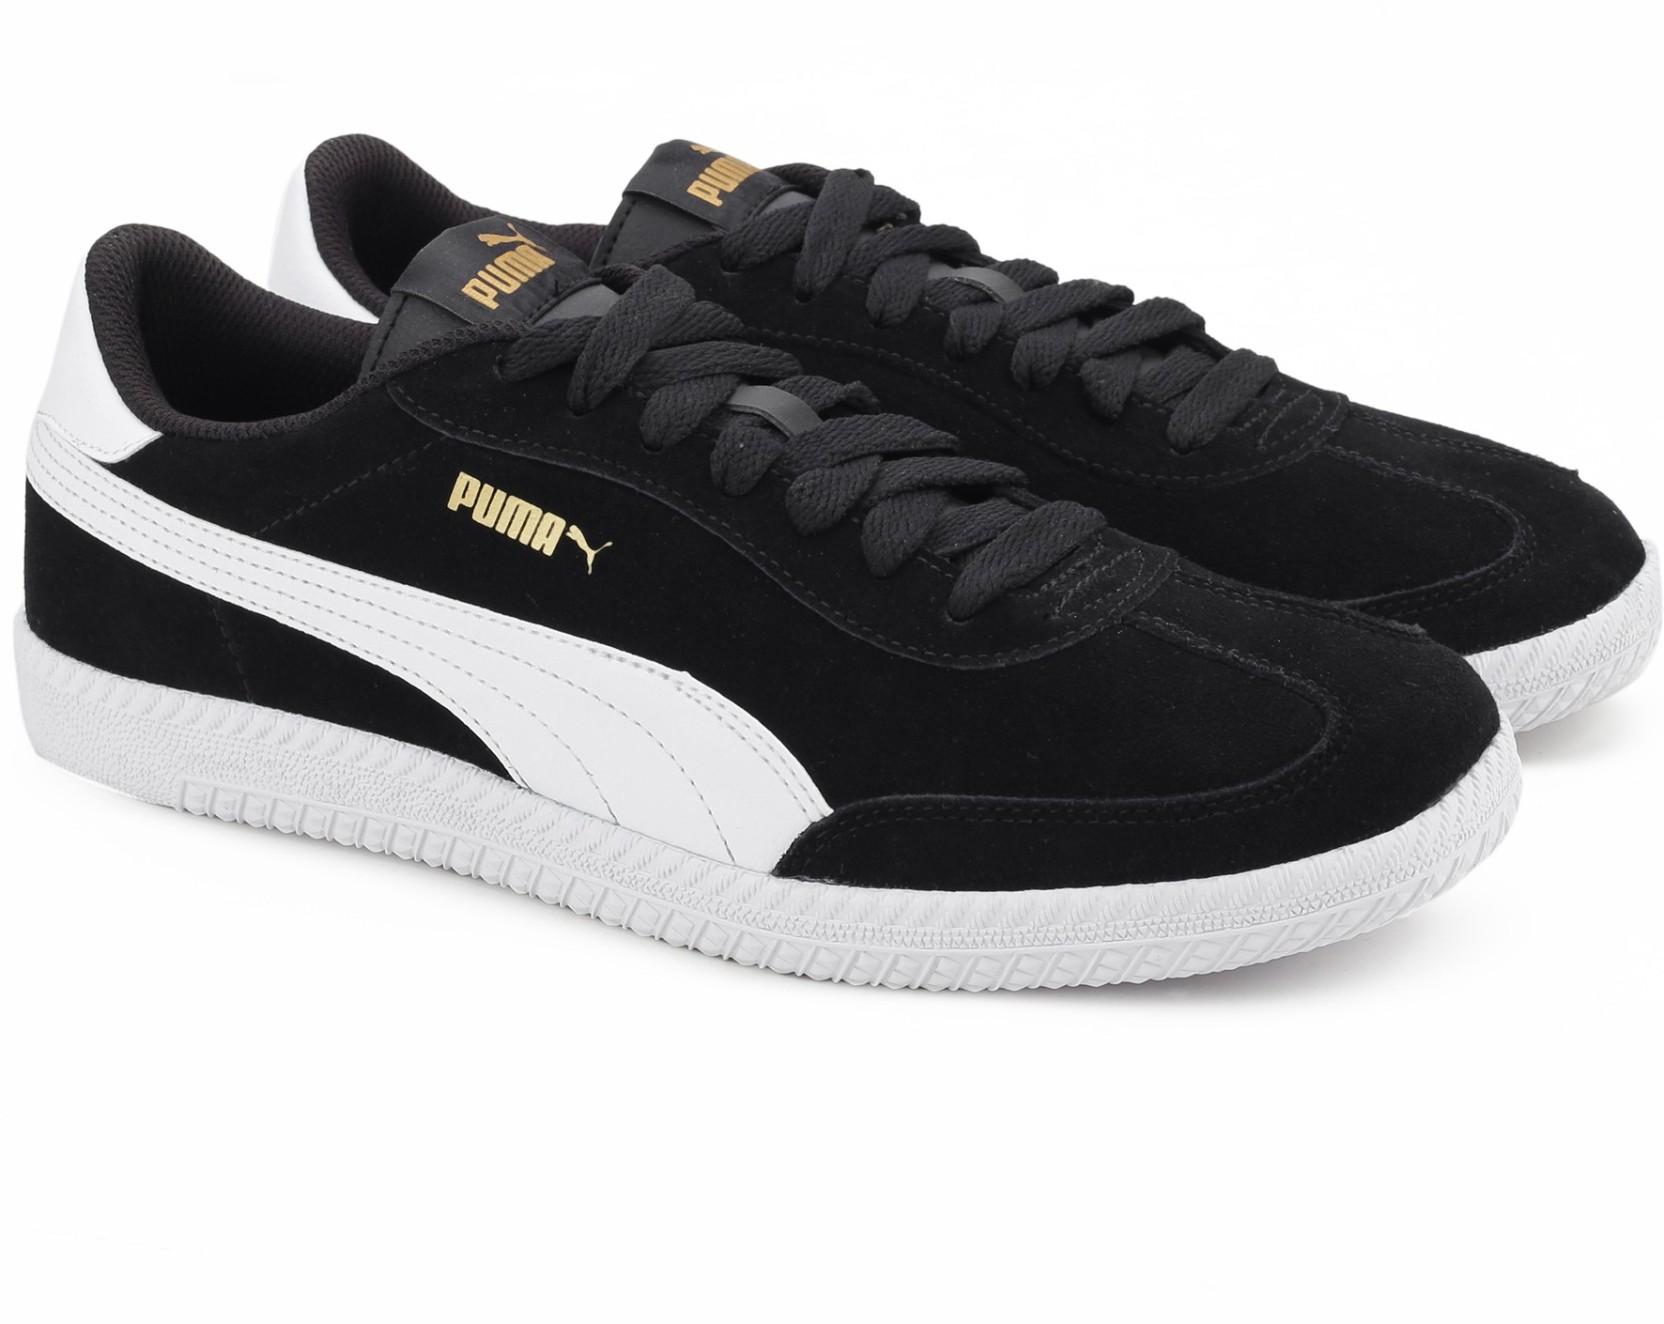 c535ad13ea3 Puma Astro Cup Sneakers For Men - Buy Blue DepthsPuma White Color ...